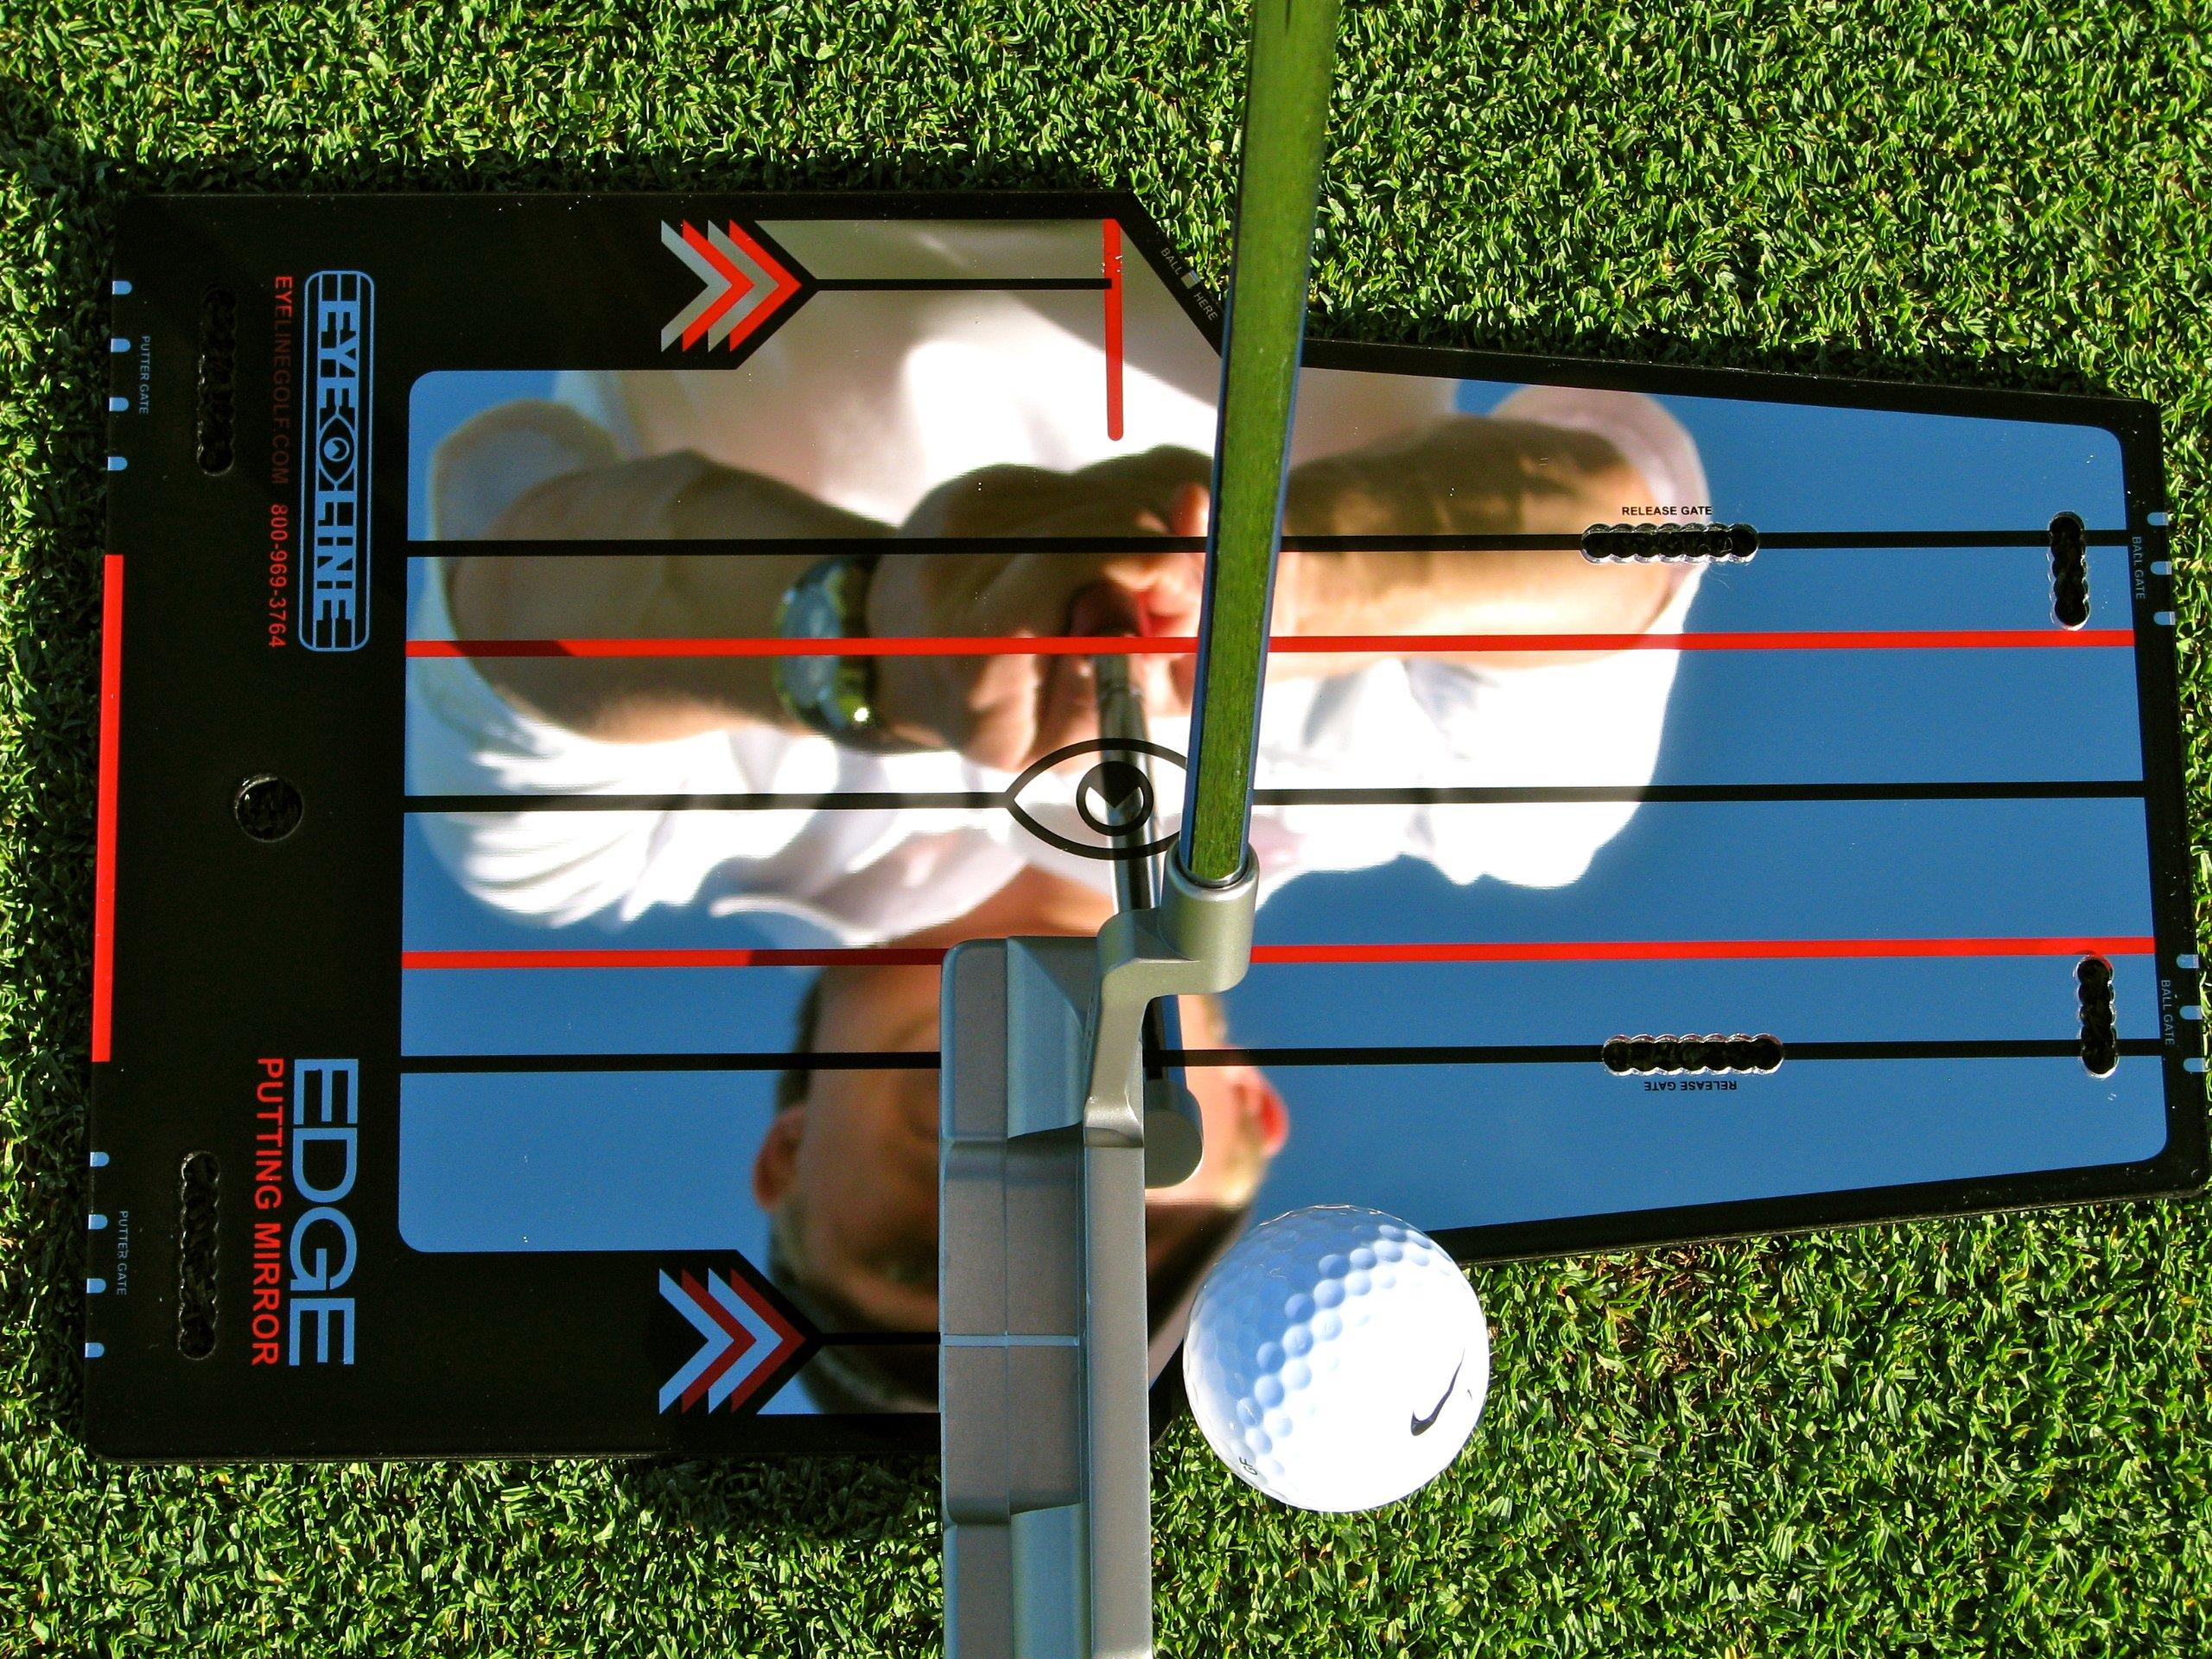 EyeLine Golf Edge Putting Mirror by EyeLine Golf